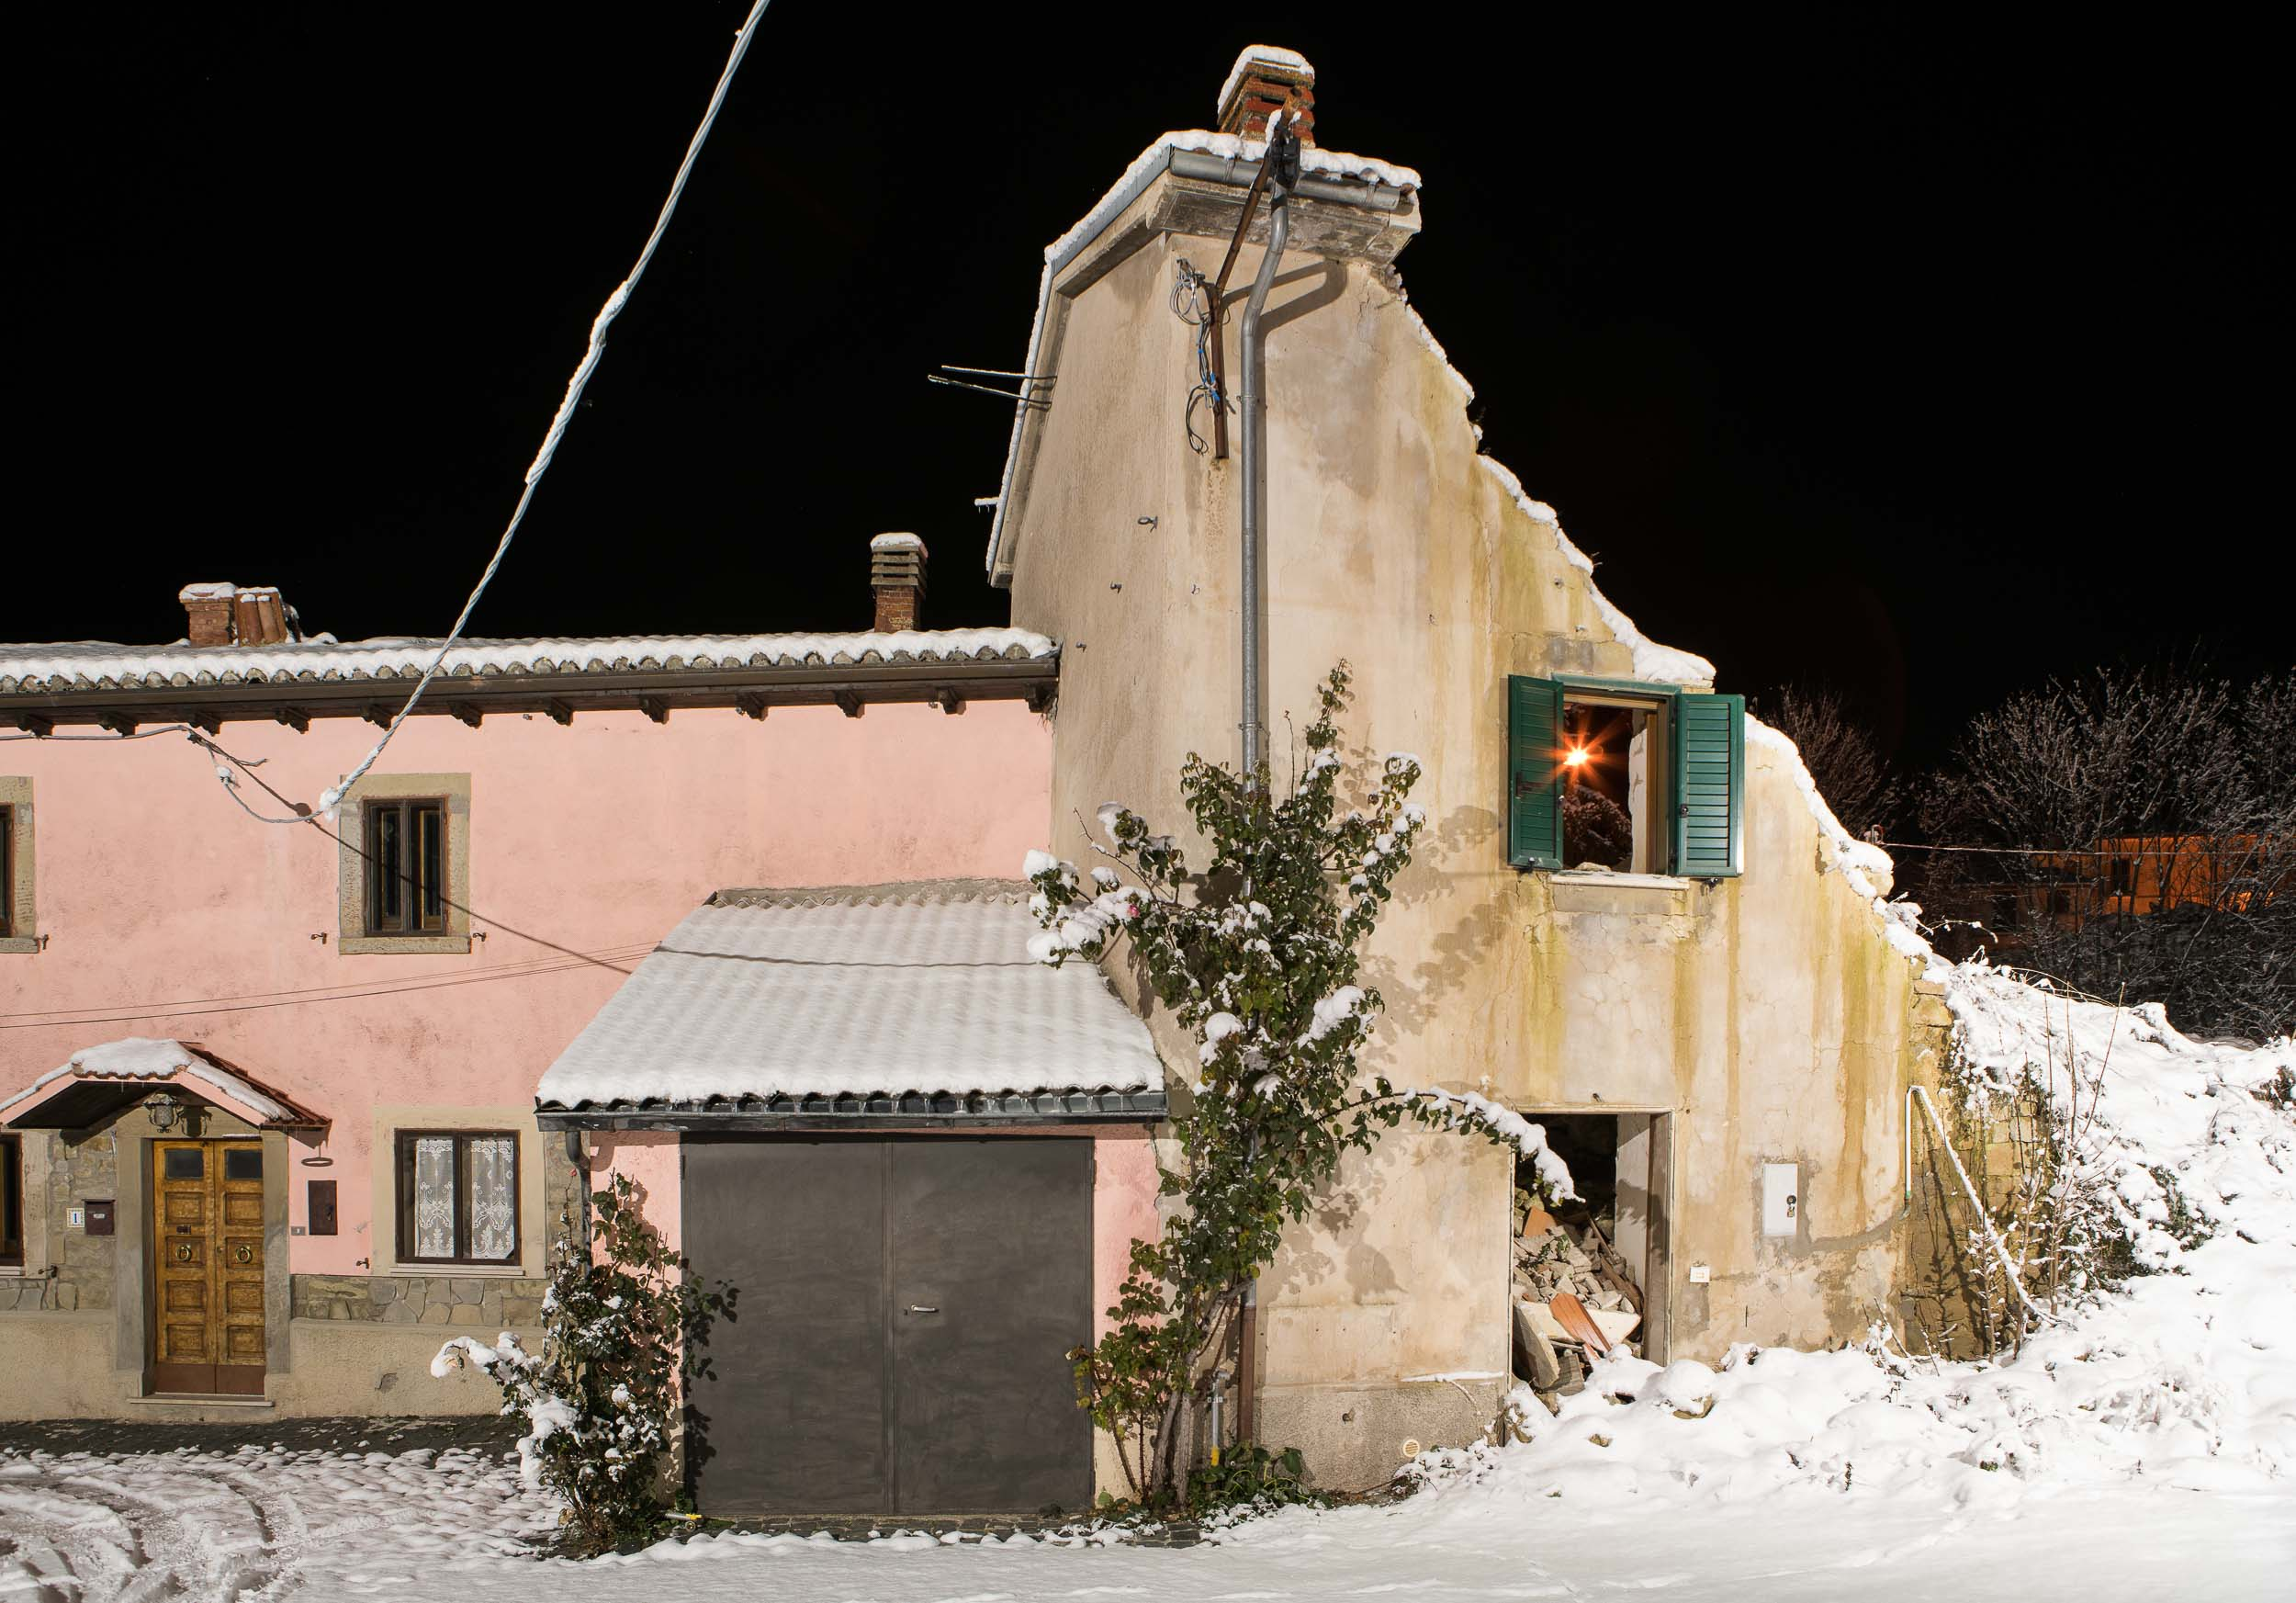 017-Campotosto_GAB2290M-Gabriele Lungarella.jpg